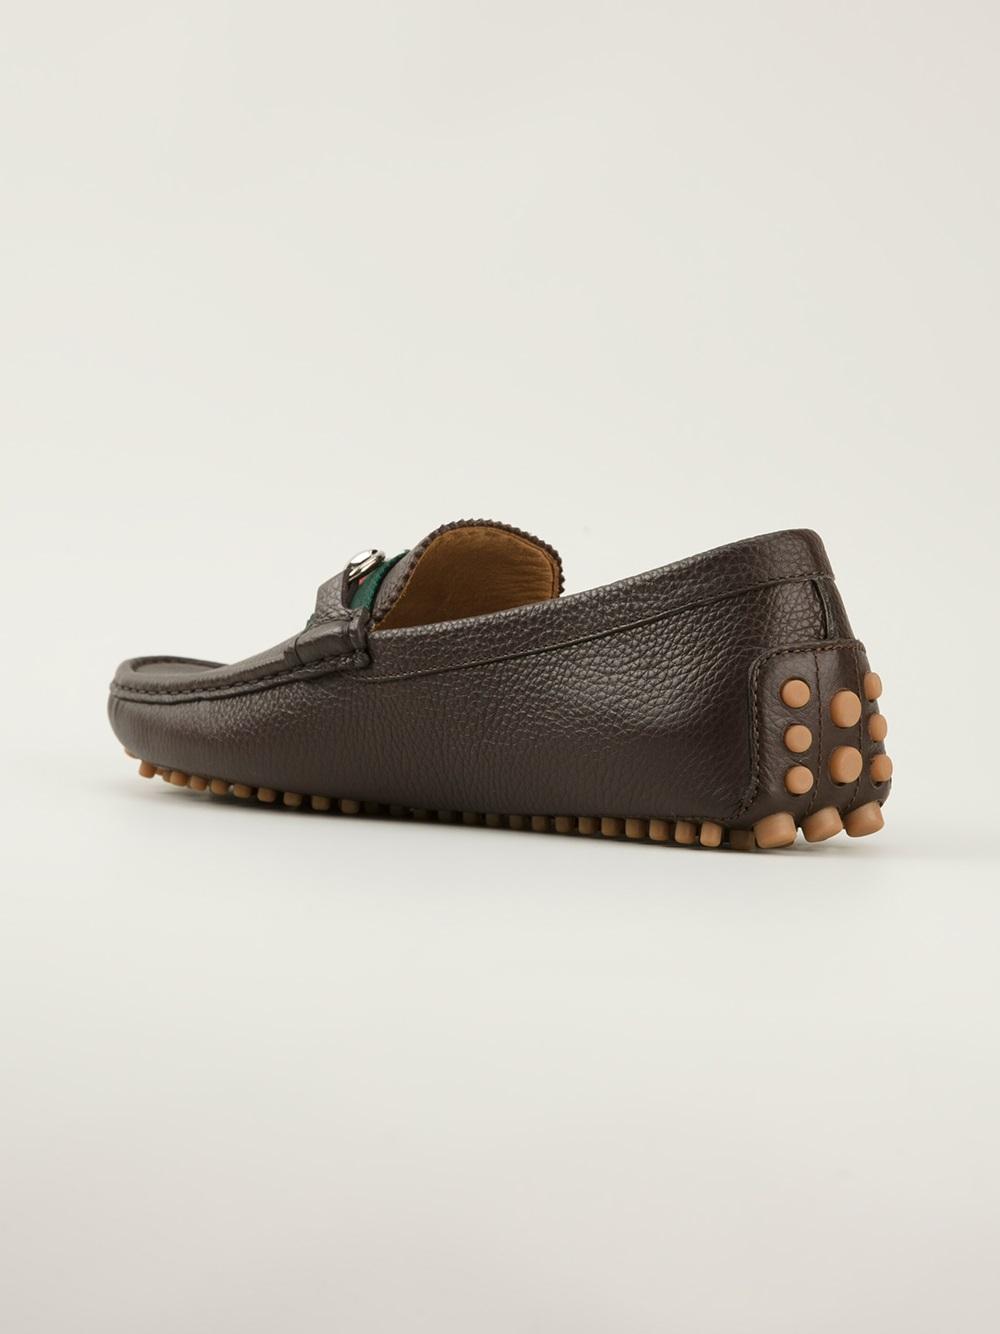 67d15ffcaeb Gucci Horsebit Loafers Men